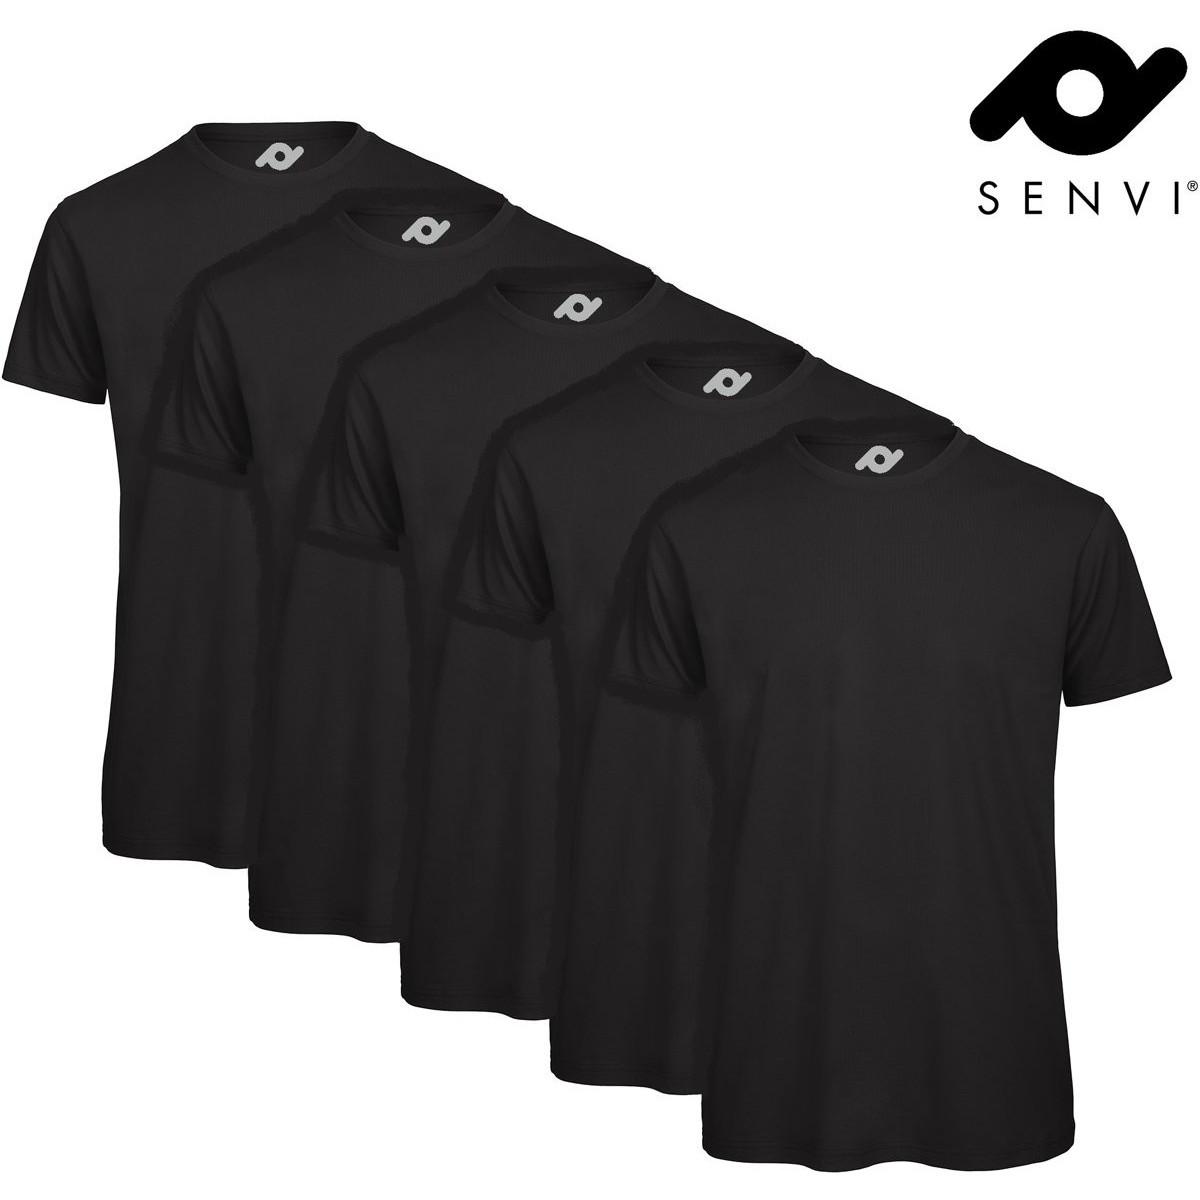 Senvi 5 pack Basic T shirt Maat M Kleur Zwart